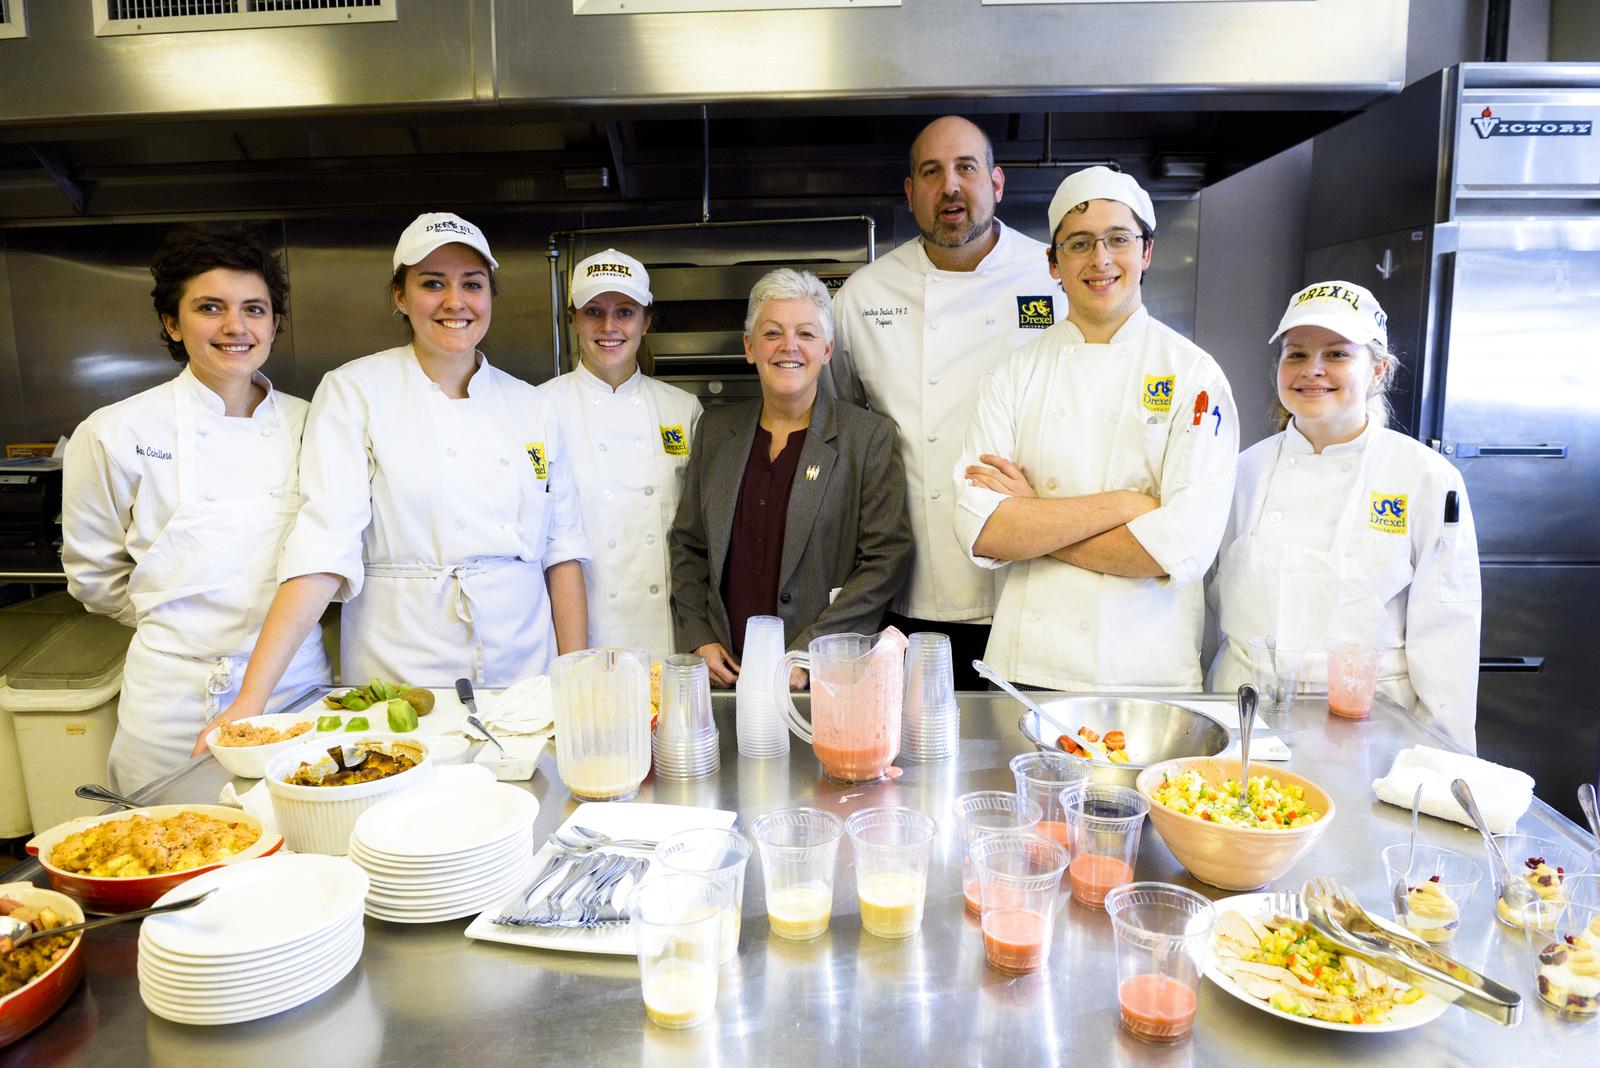 Office of the Administrator - Philadelphia - Administrator Gina McCarthy visiting the Food Lab at Drexel University [412-APD-1265-2014-11-14_Philadelphia_031.jpg]